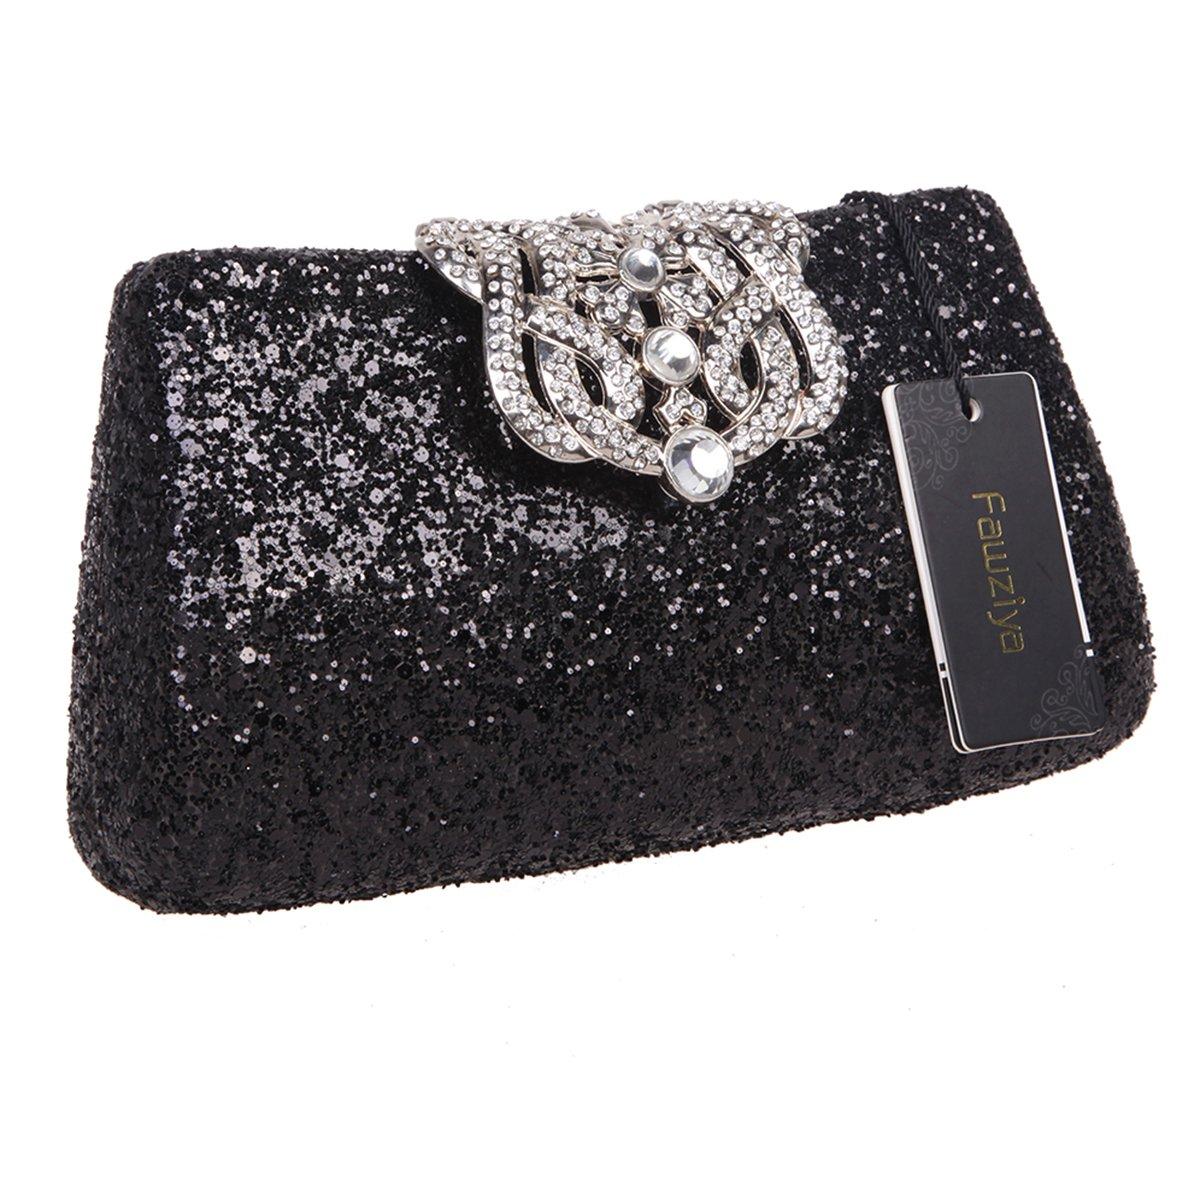 Fawziya Crown Glitter Clutches And Evening Bags Bling Clutch Purses For  Women-Black  Amazon.ca  Shoes   Handbags 1180c553386e